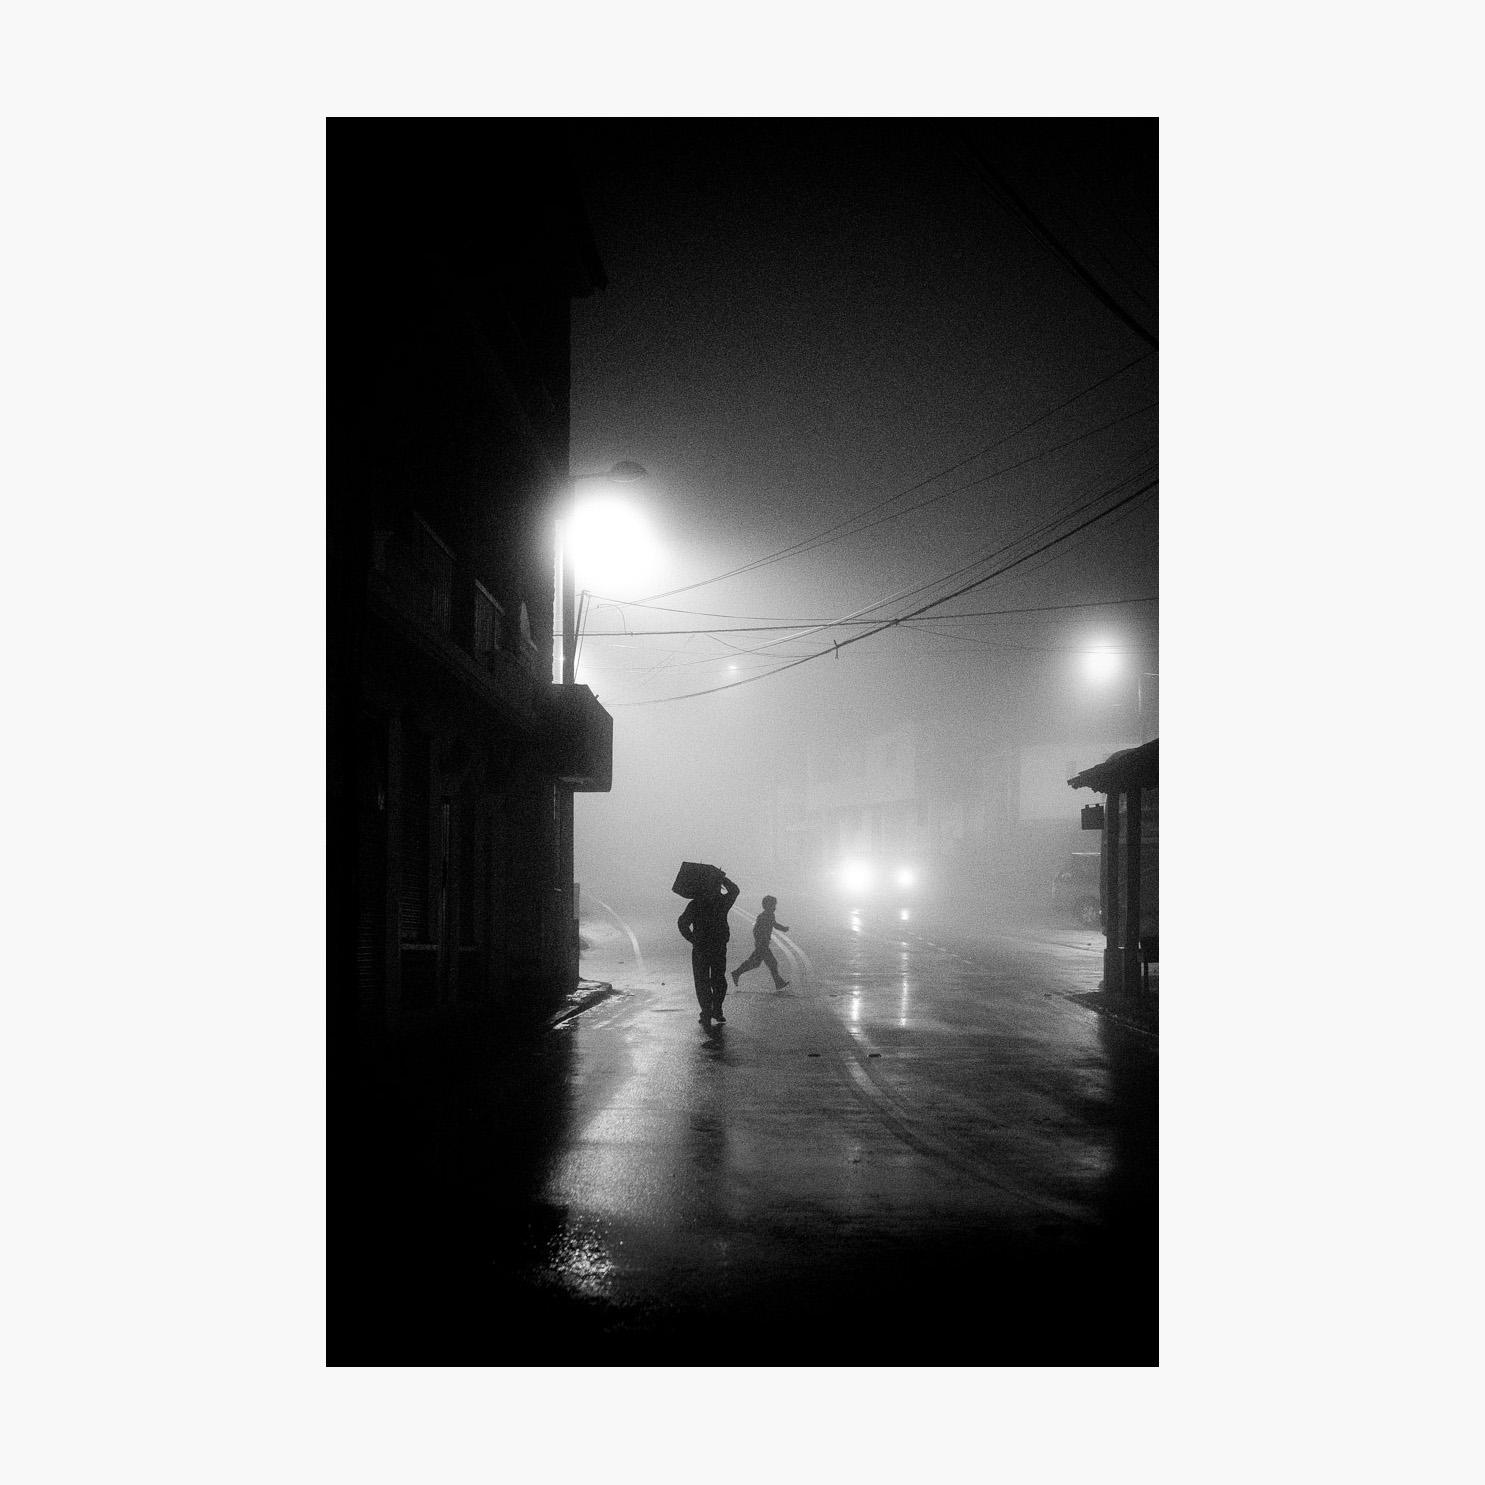 ©-2018-Harry-W-Edmonds-London-Photographers-Note-FujiFilm-Takeover-Header-PN01.jpg